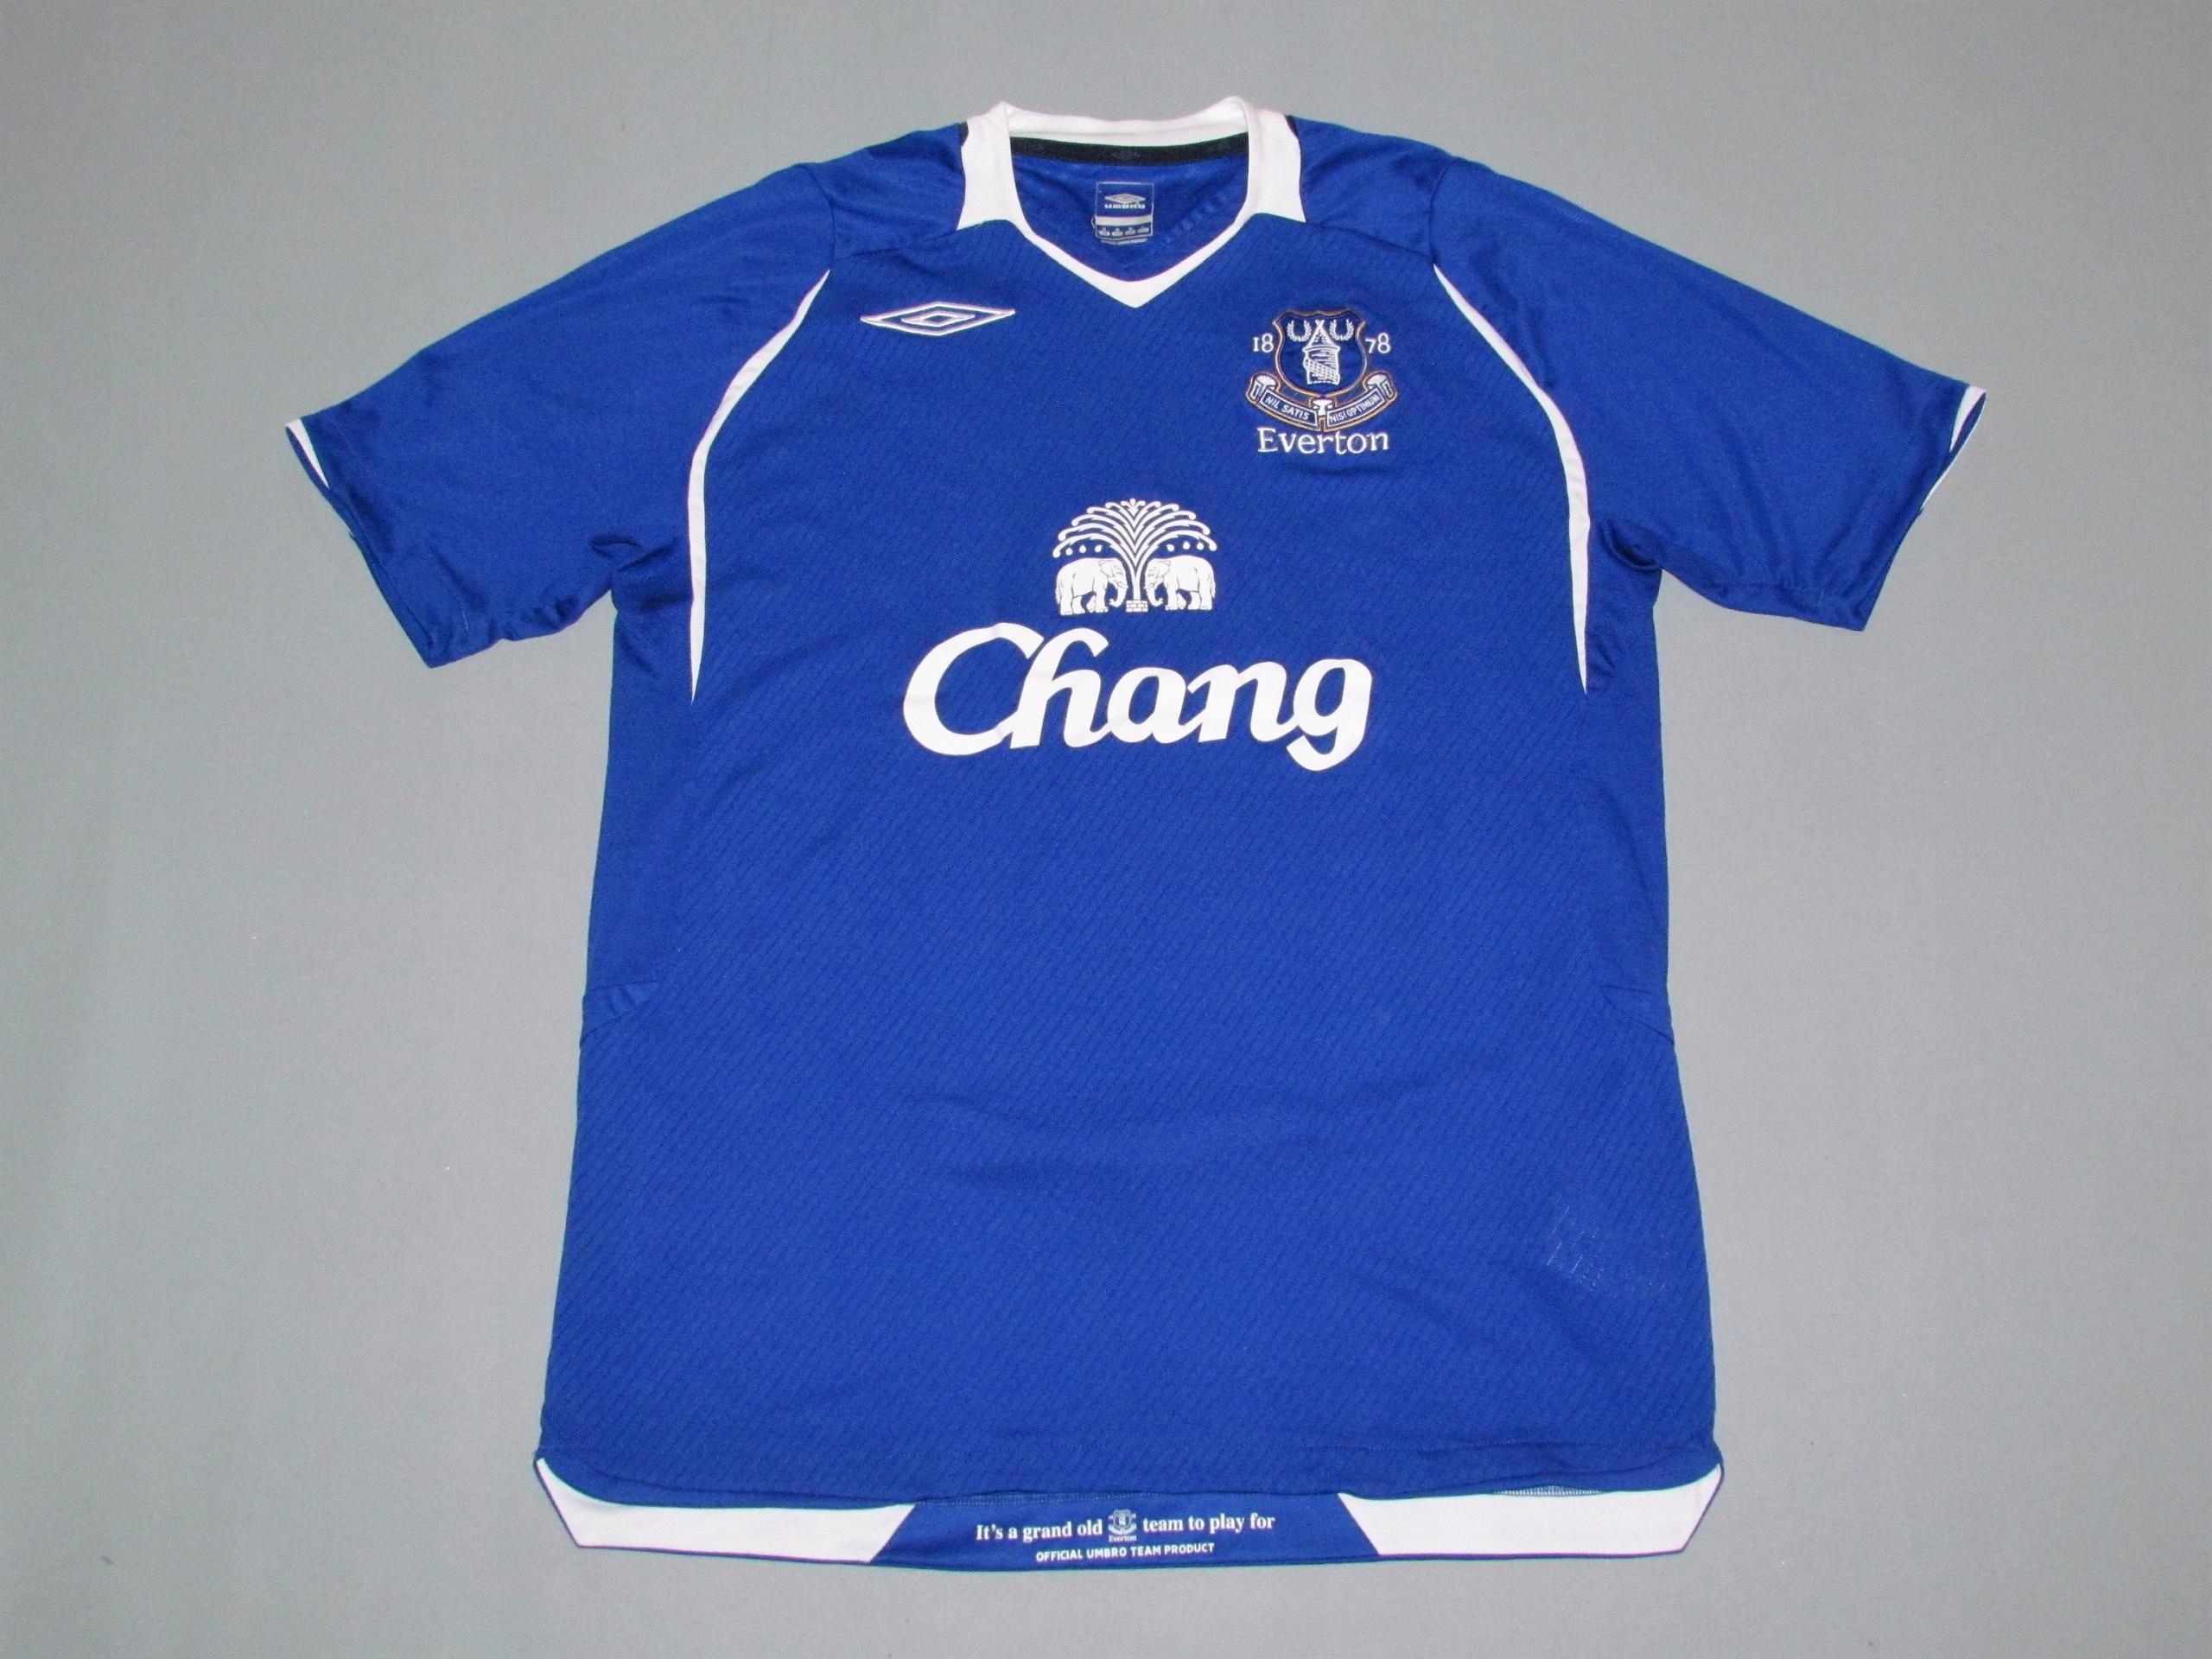 Koszulka Umbro Everton roz.M